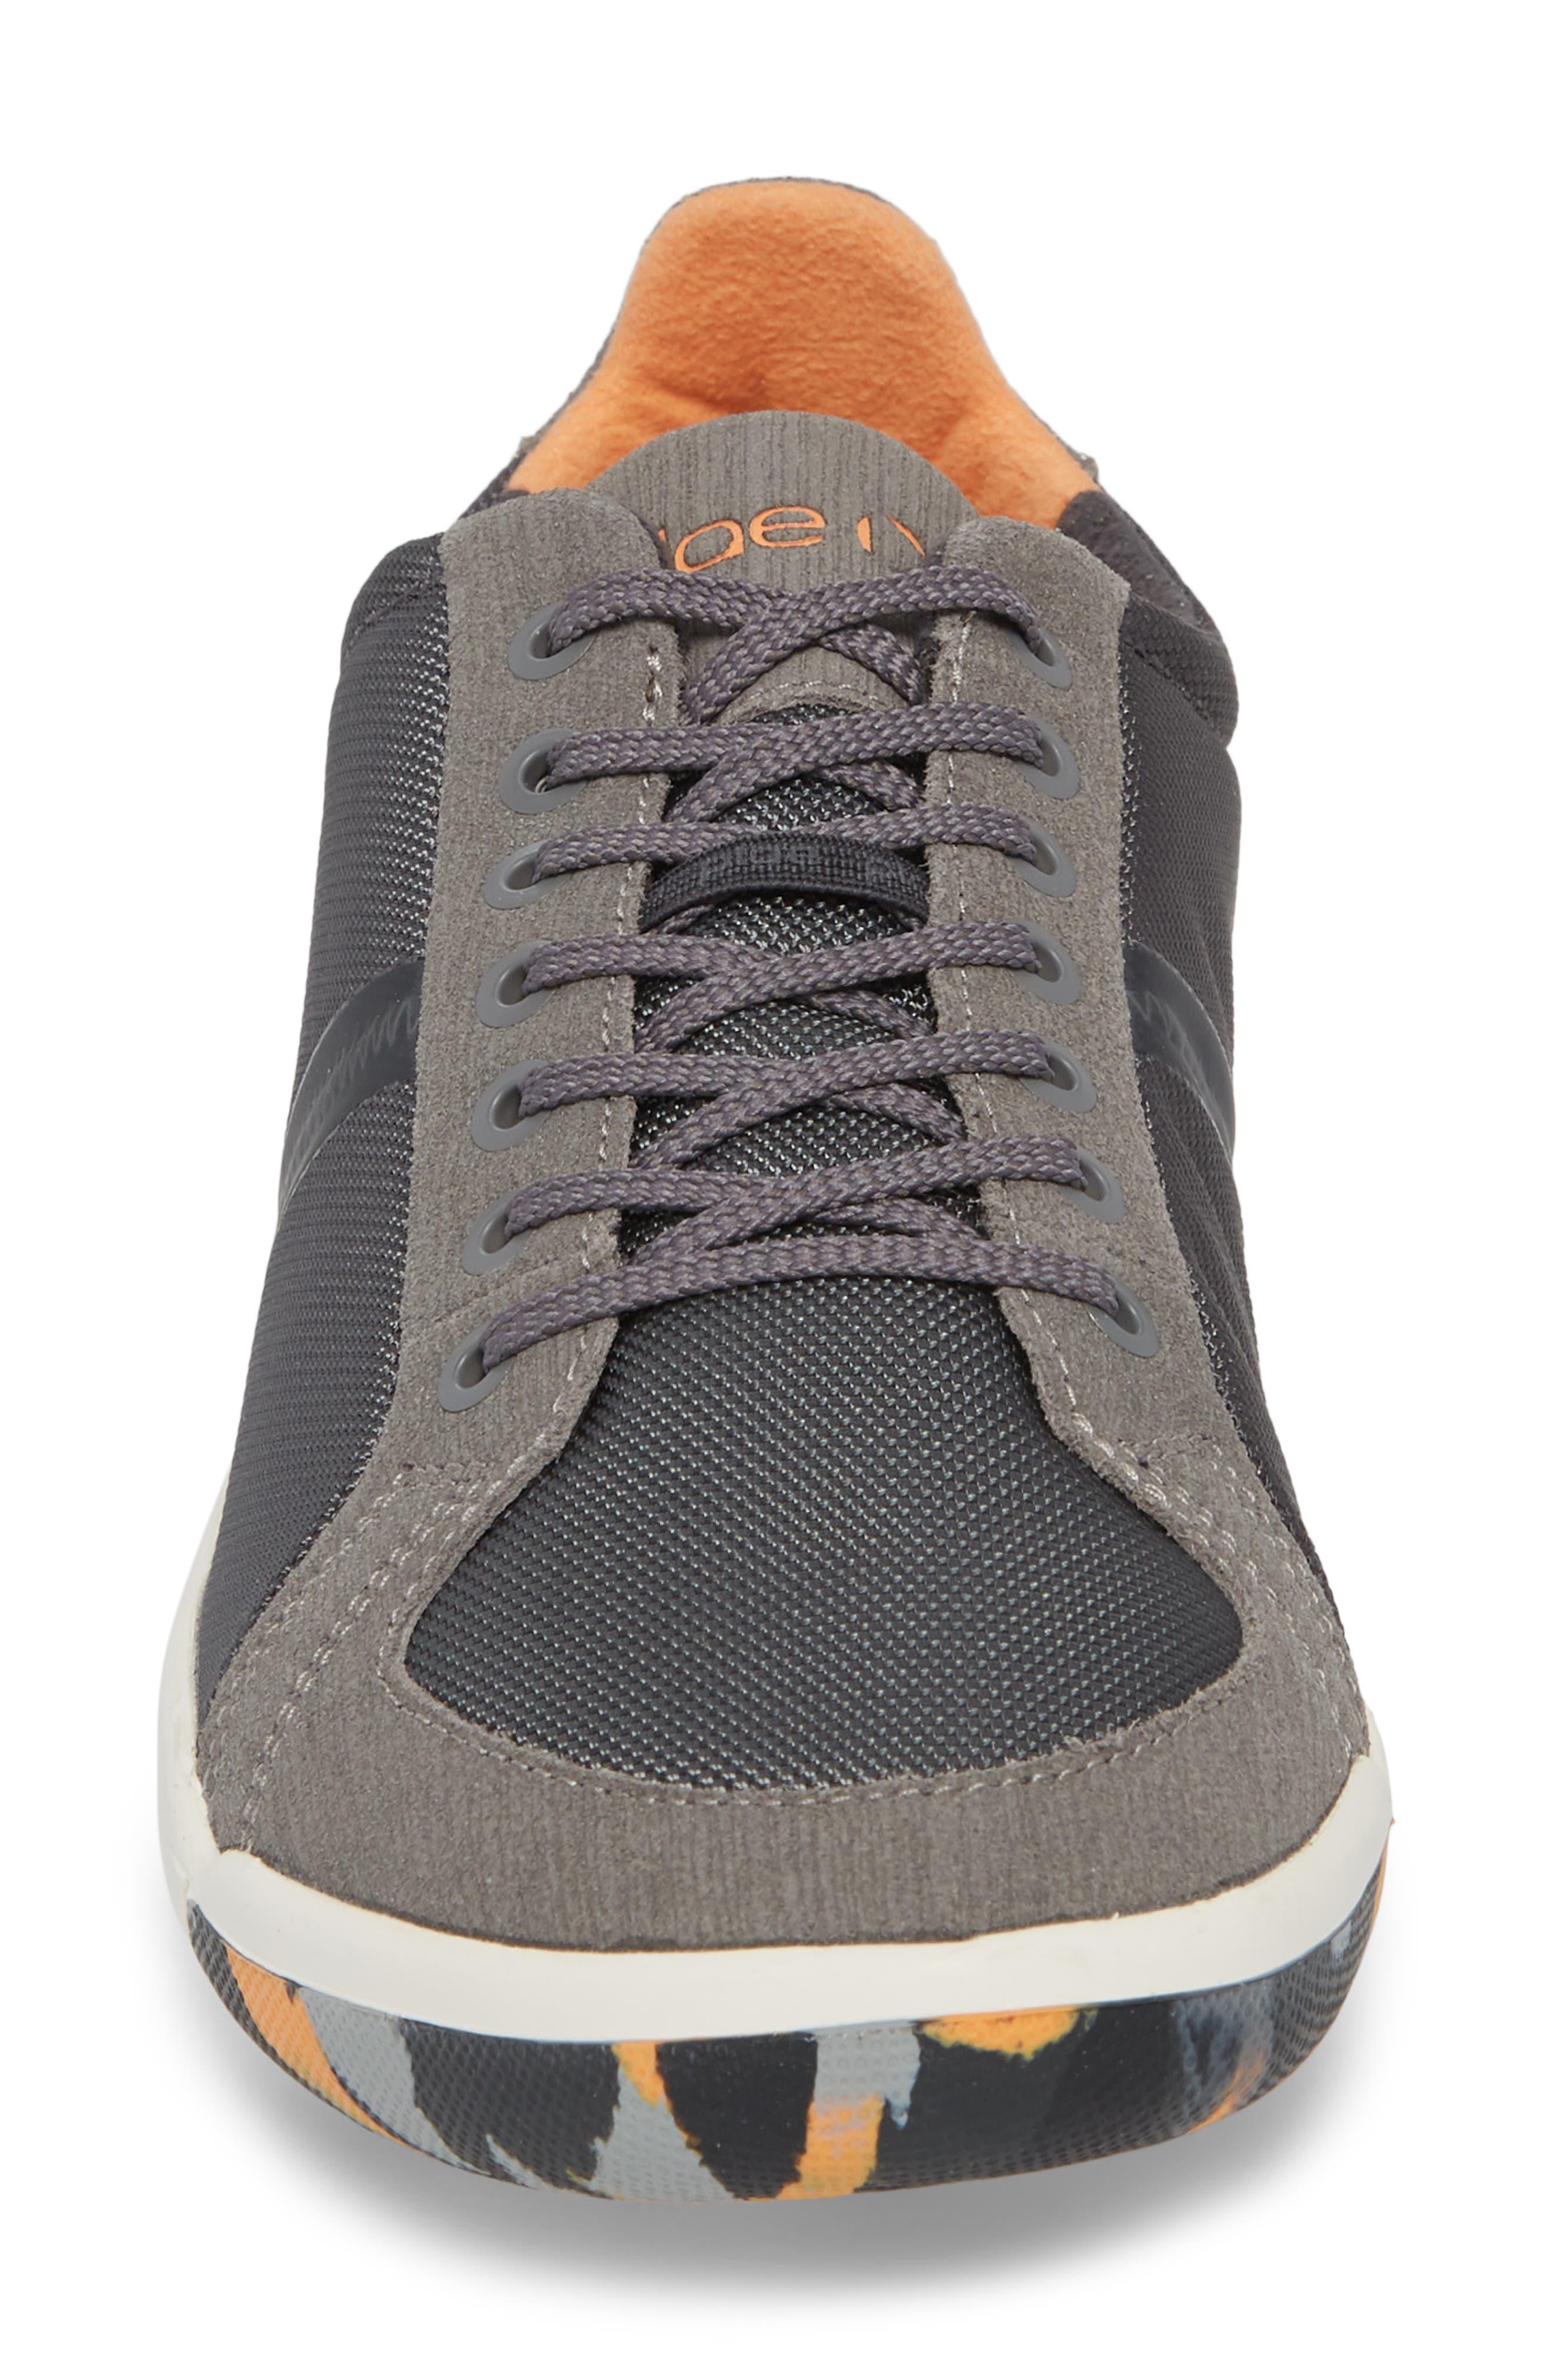 Prospect Low Top Sneaker,                             Alternate thumbnail 4, color,                             070